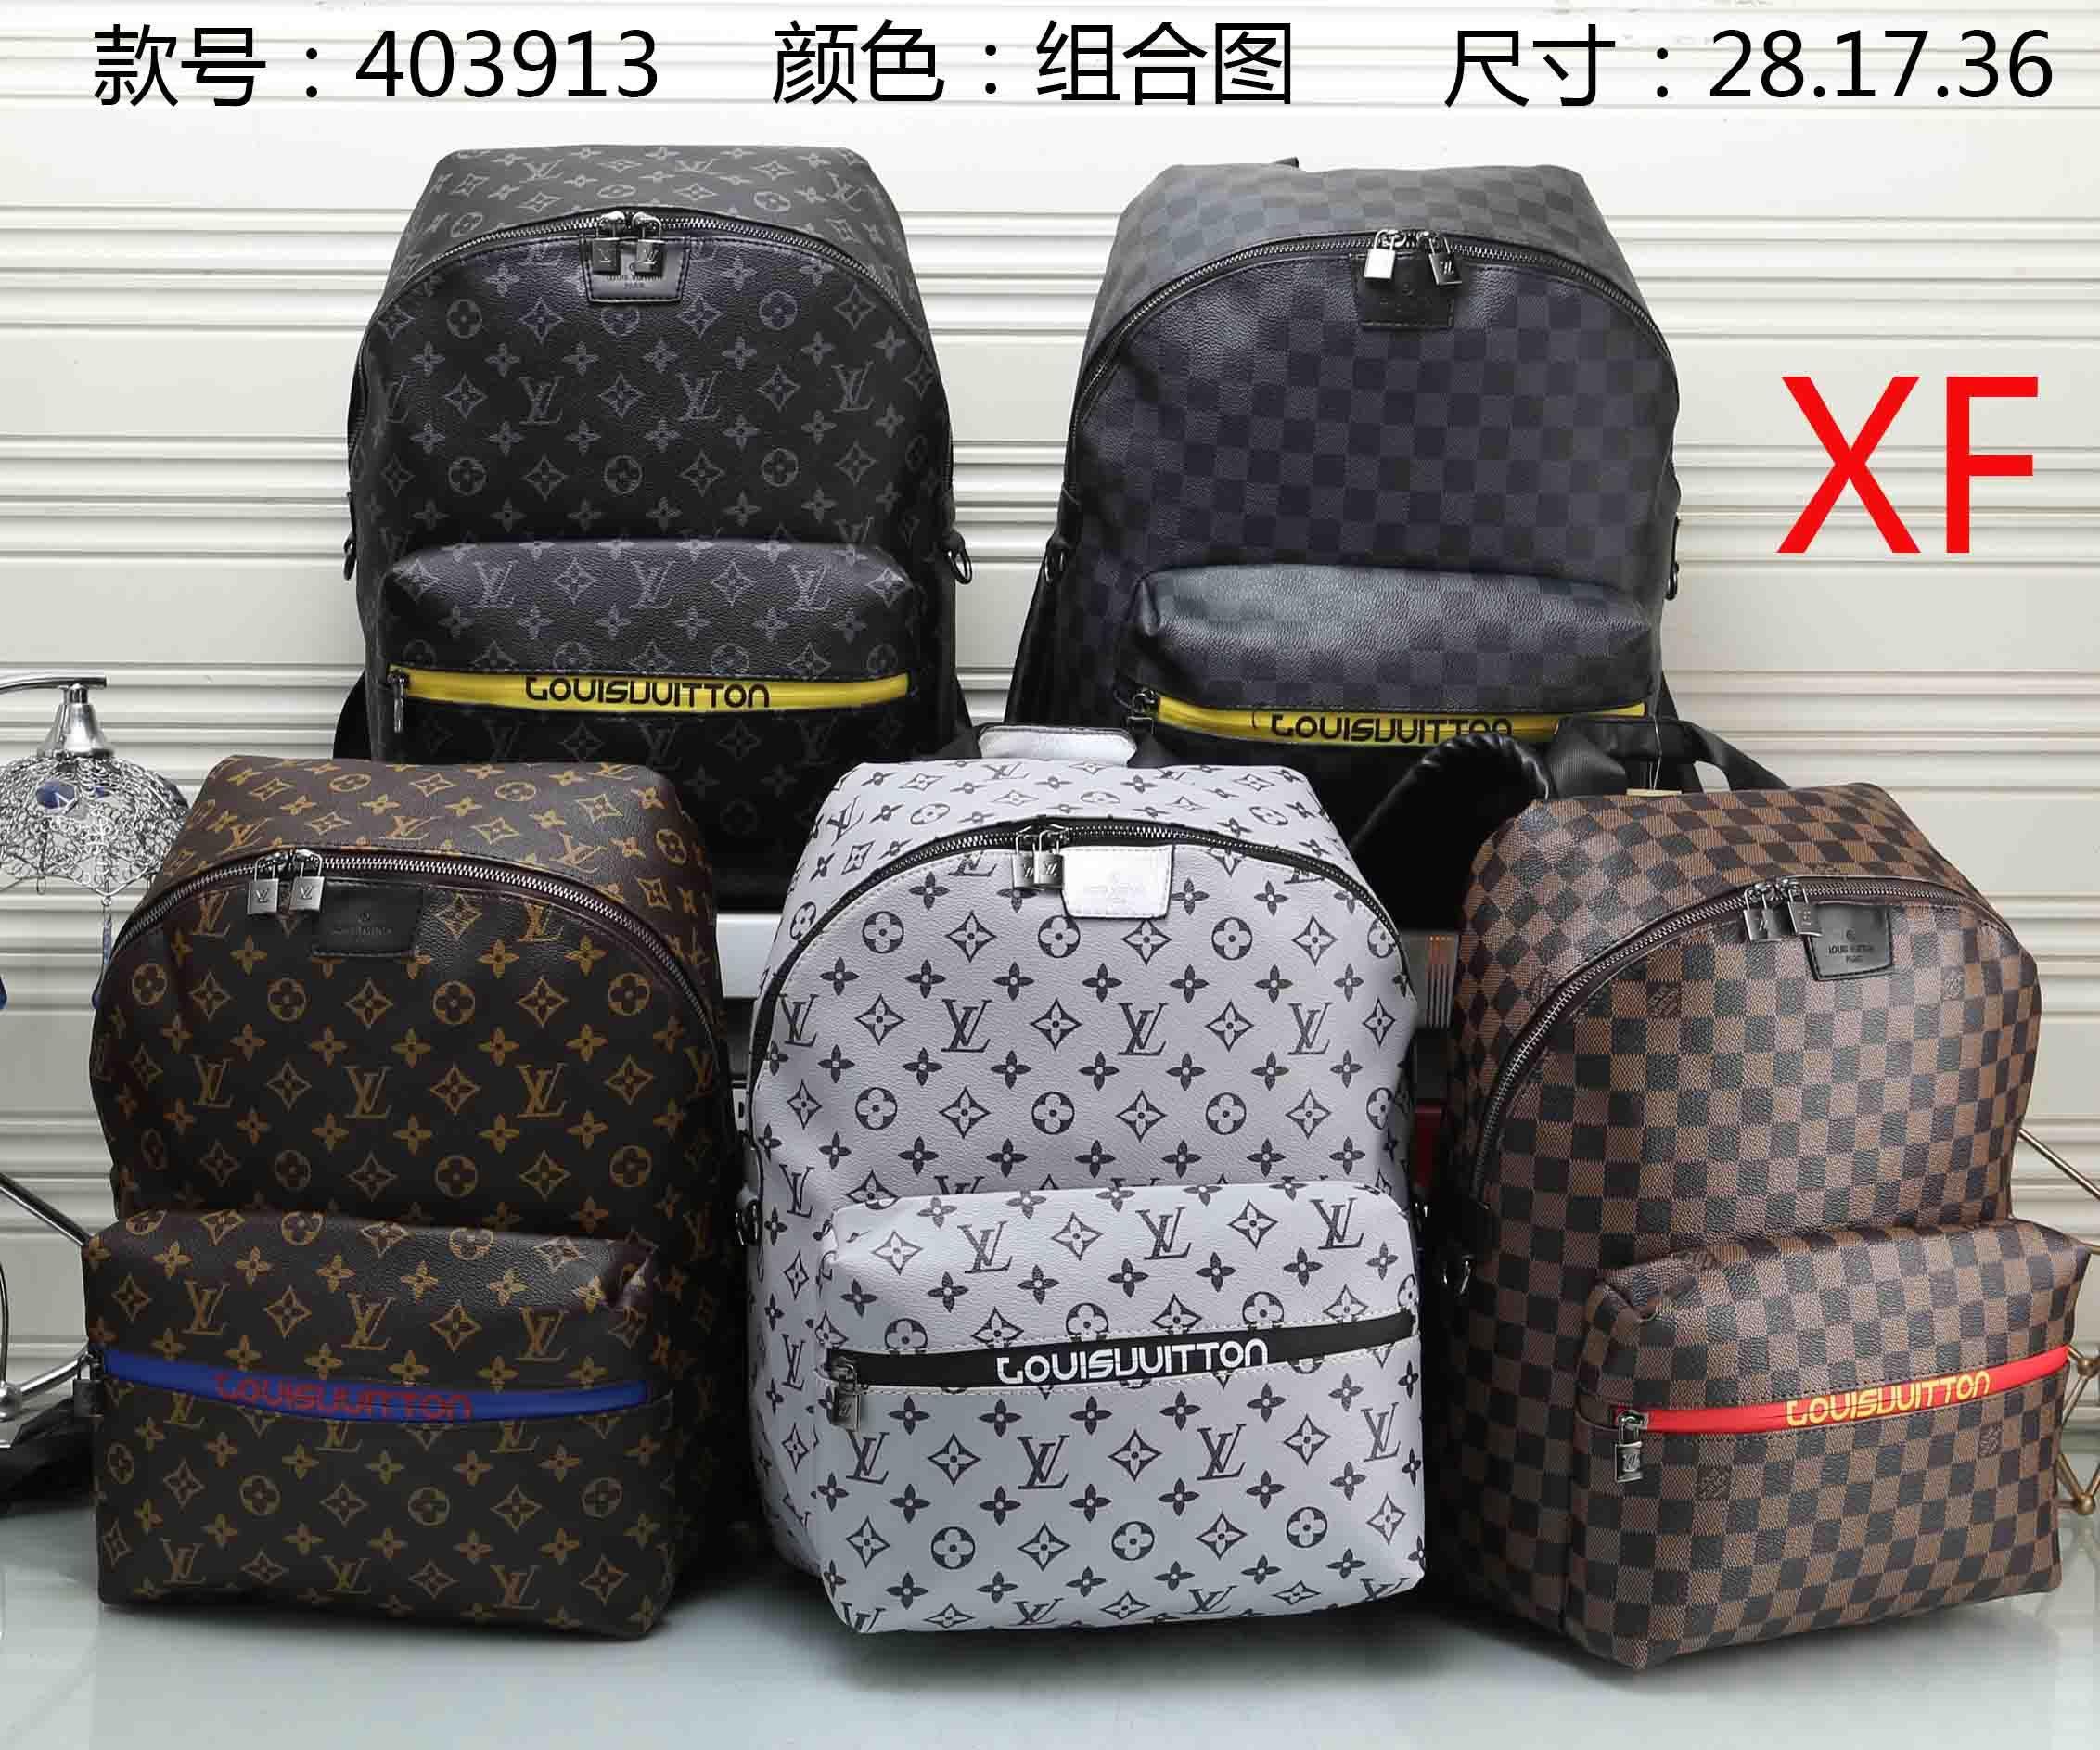 291d0254c431 Men Backpack Luxury Brand Lady Leather Handbags Wallet Shoulder Bag Tote  Clutch Women Bags Designer For Women  003 Handbag Brands Cheap Bags From  Ipl393